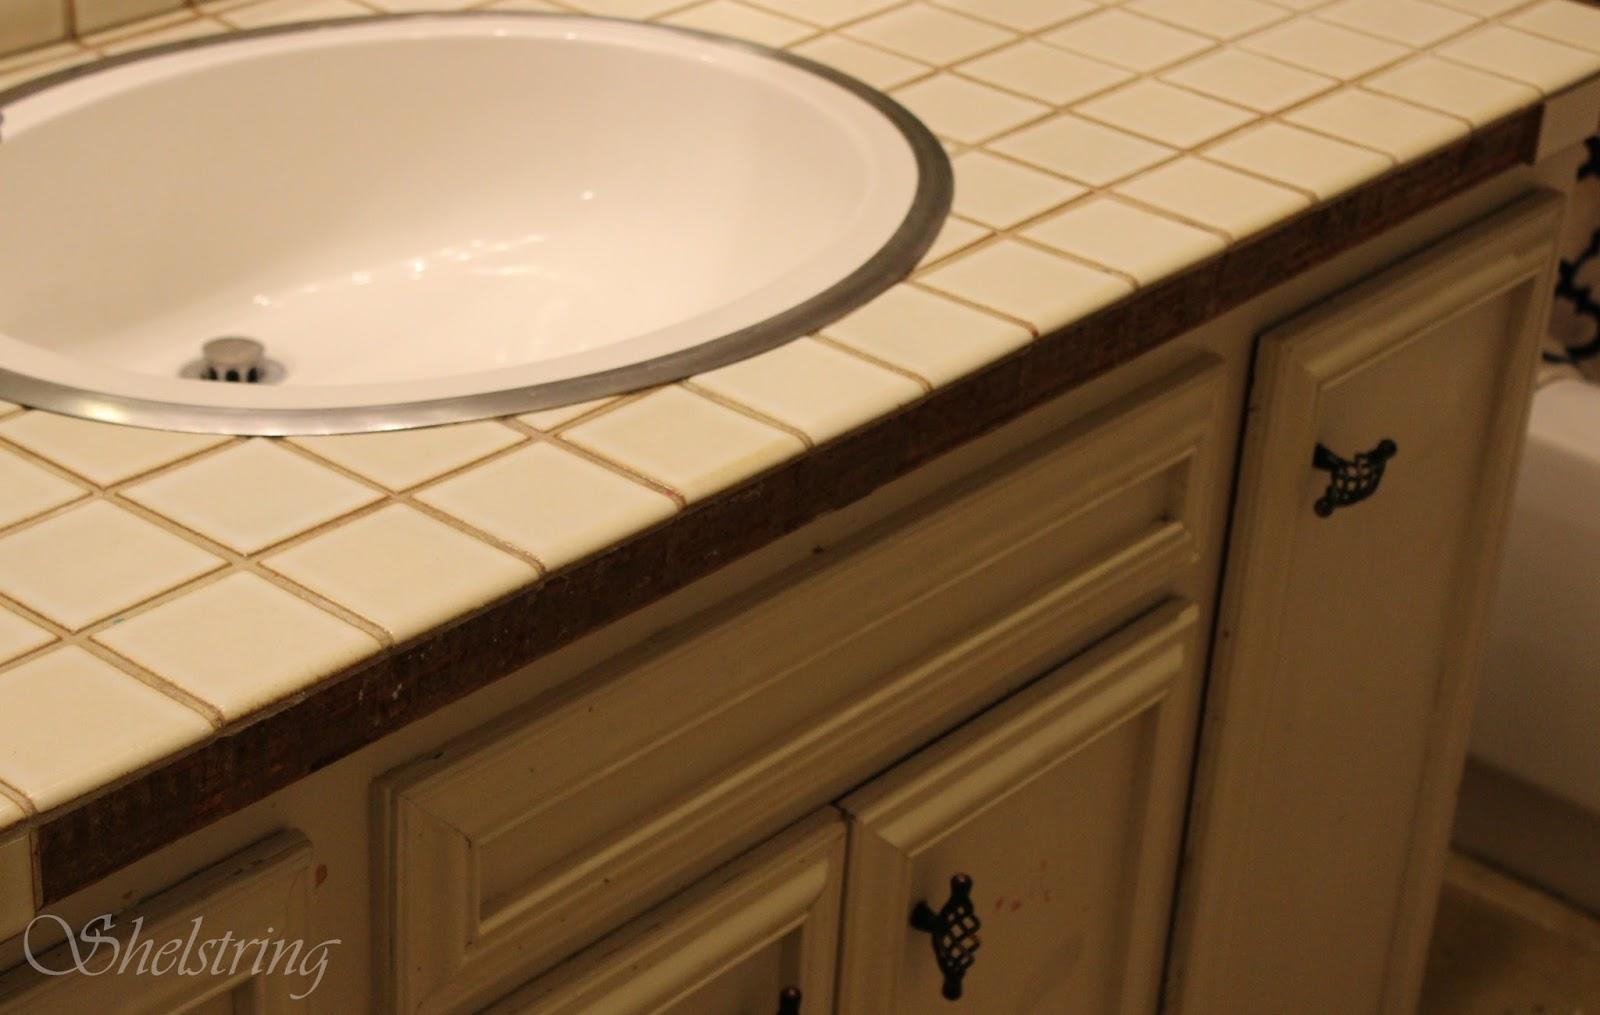 Shelstring Blog Bathroom Tile Fix Howto - Fix bathroom tile